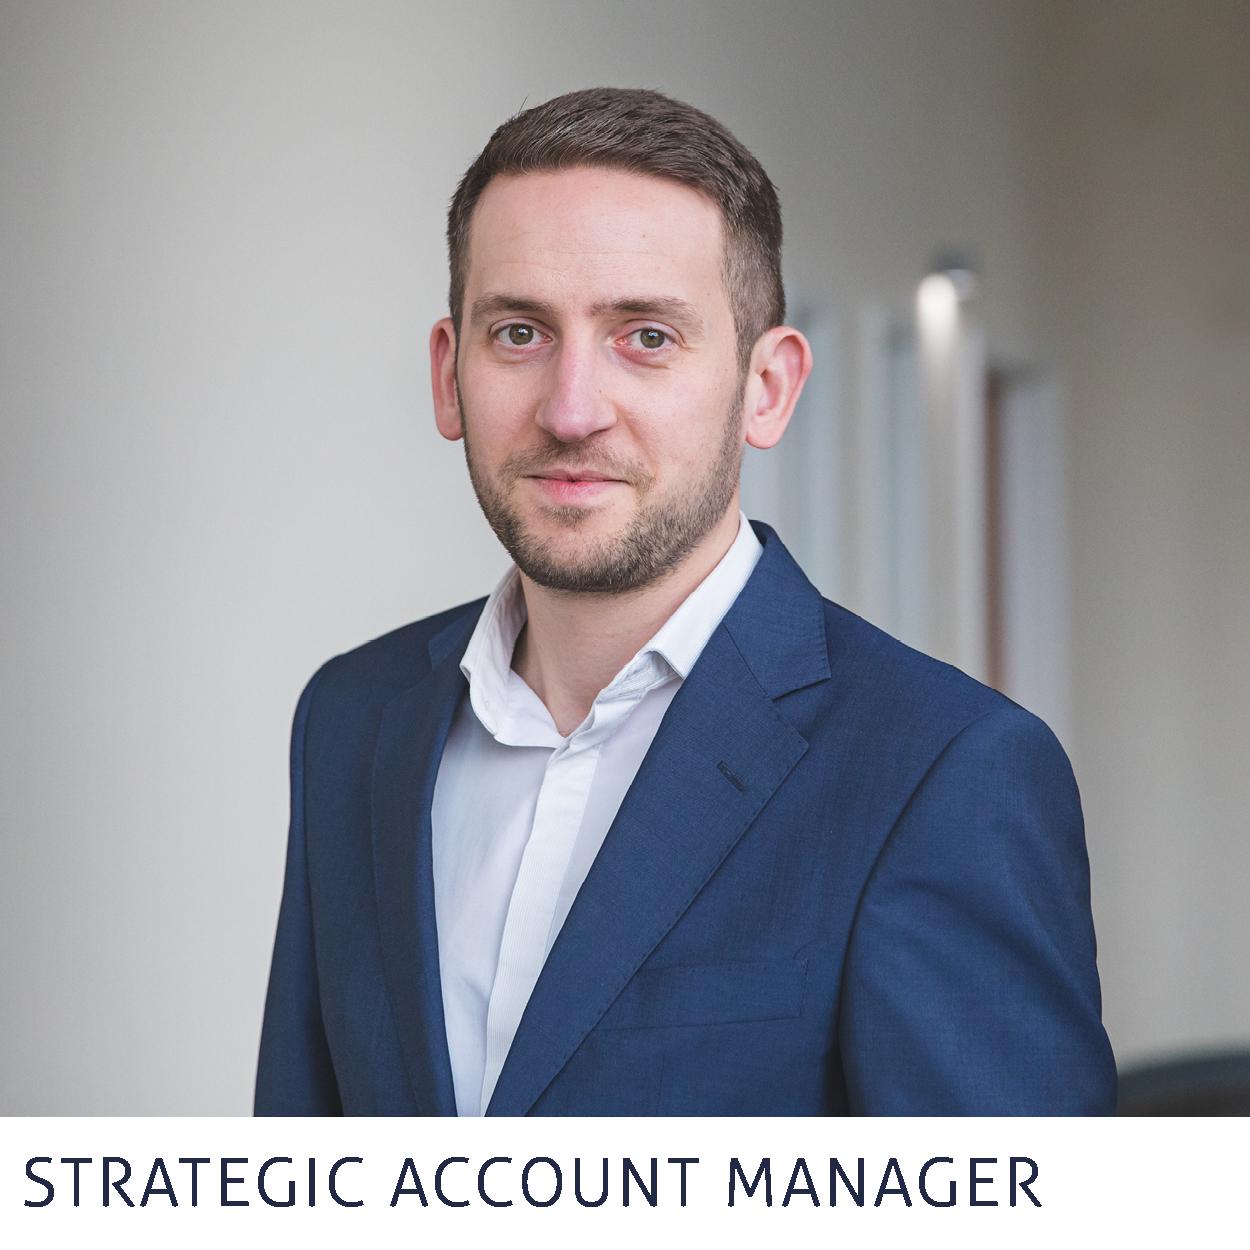 Billy Kontoulis, Strategic Account Manager